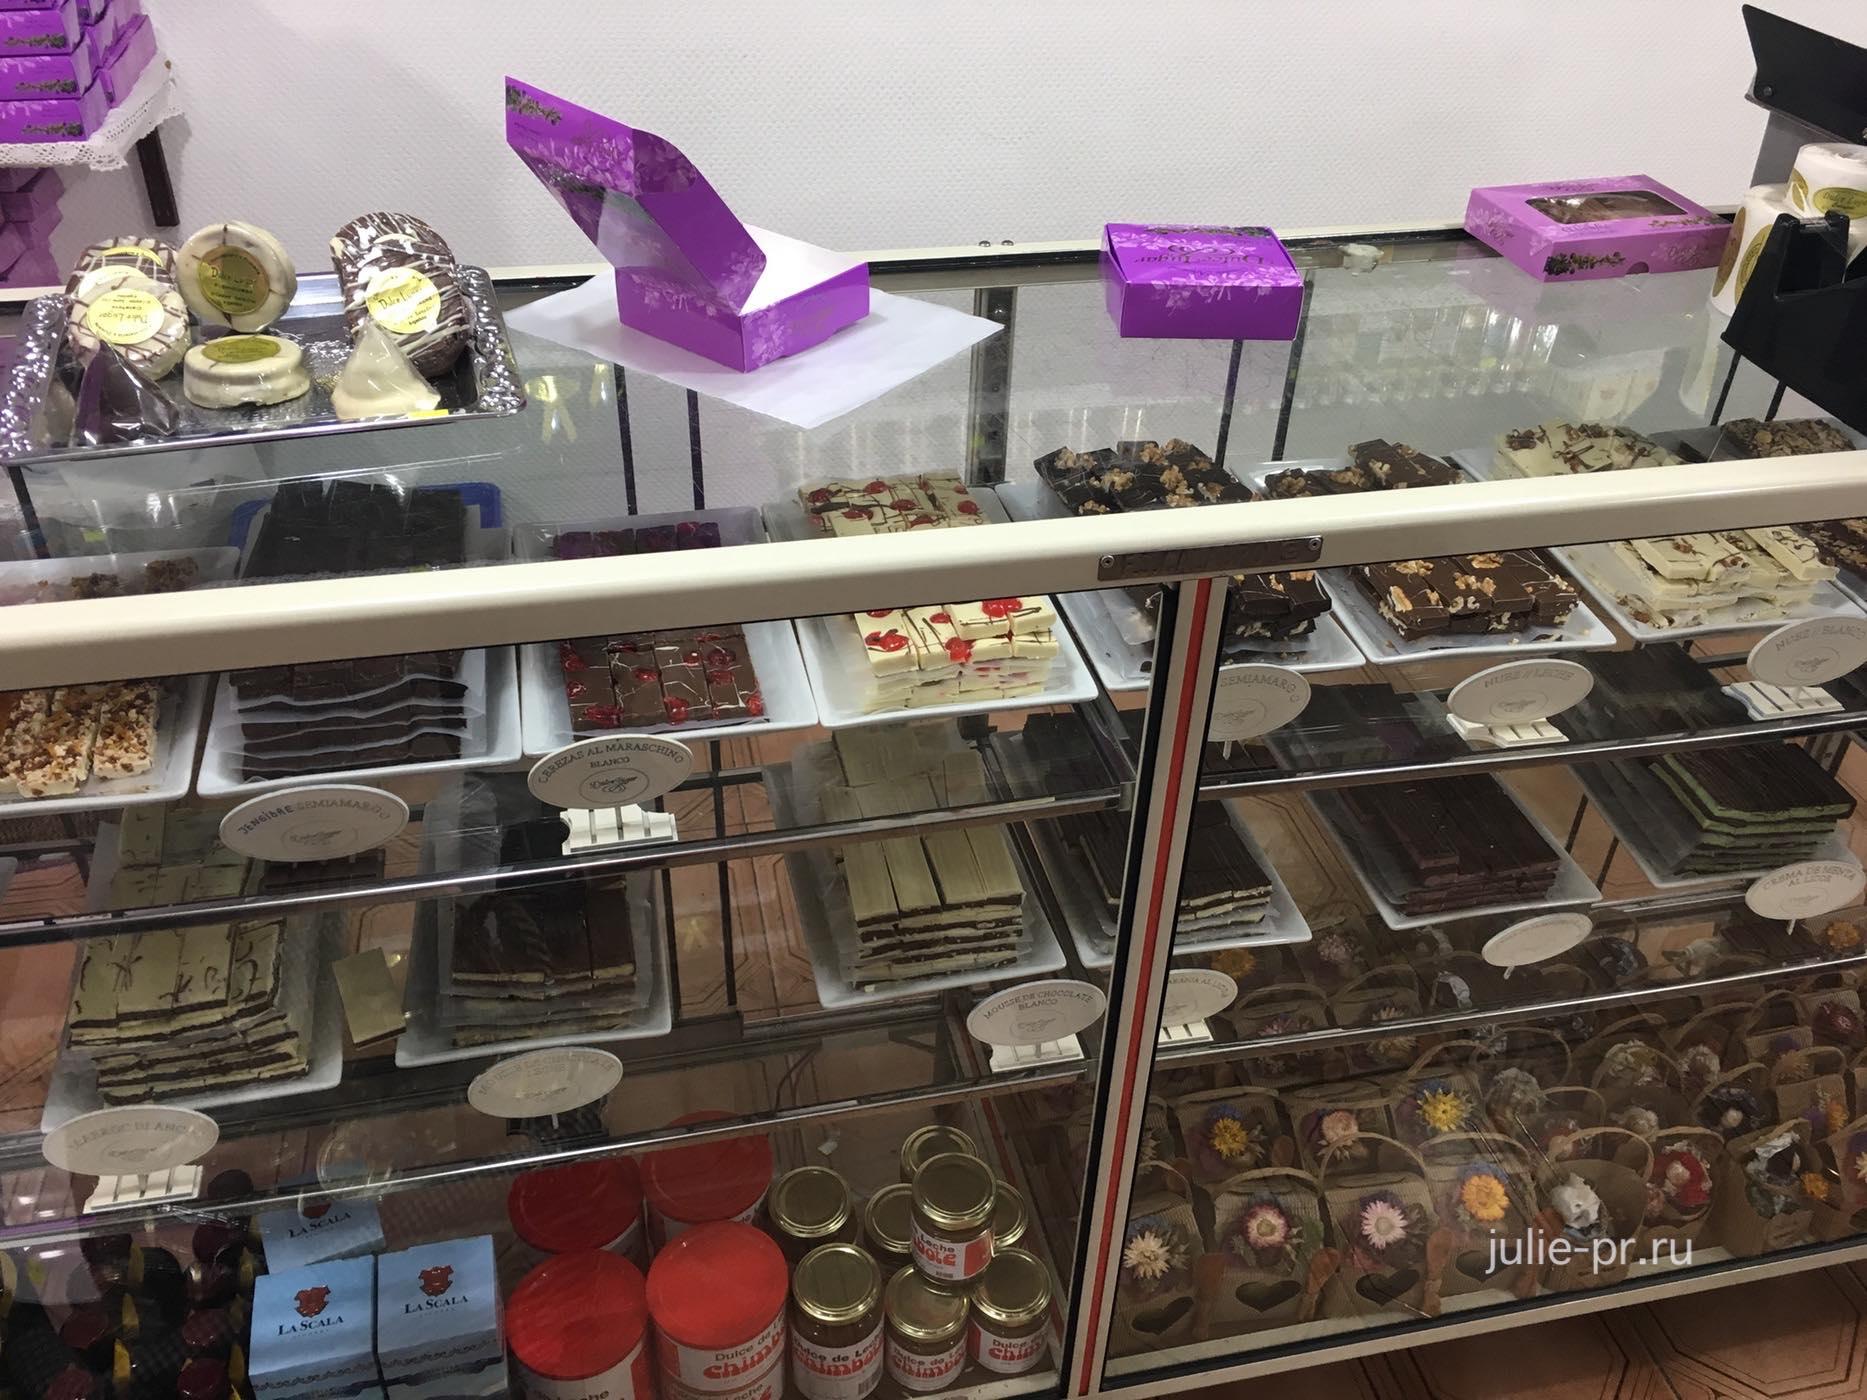 Аргентина, Эль-Калафате, шоколадный магазин